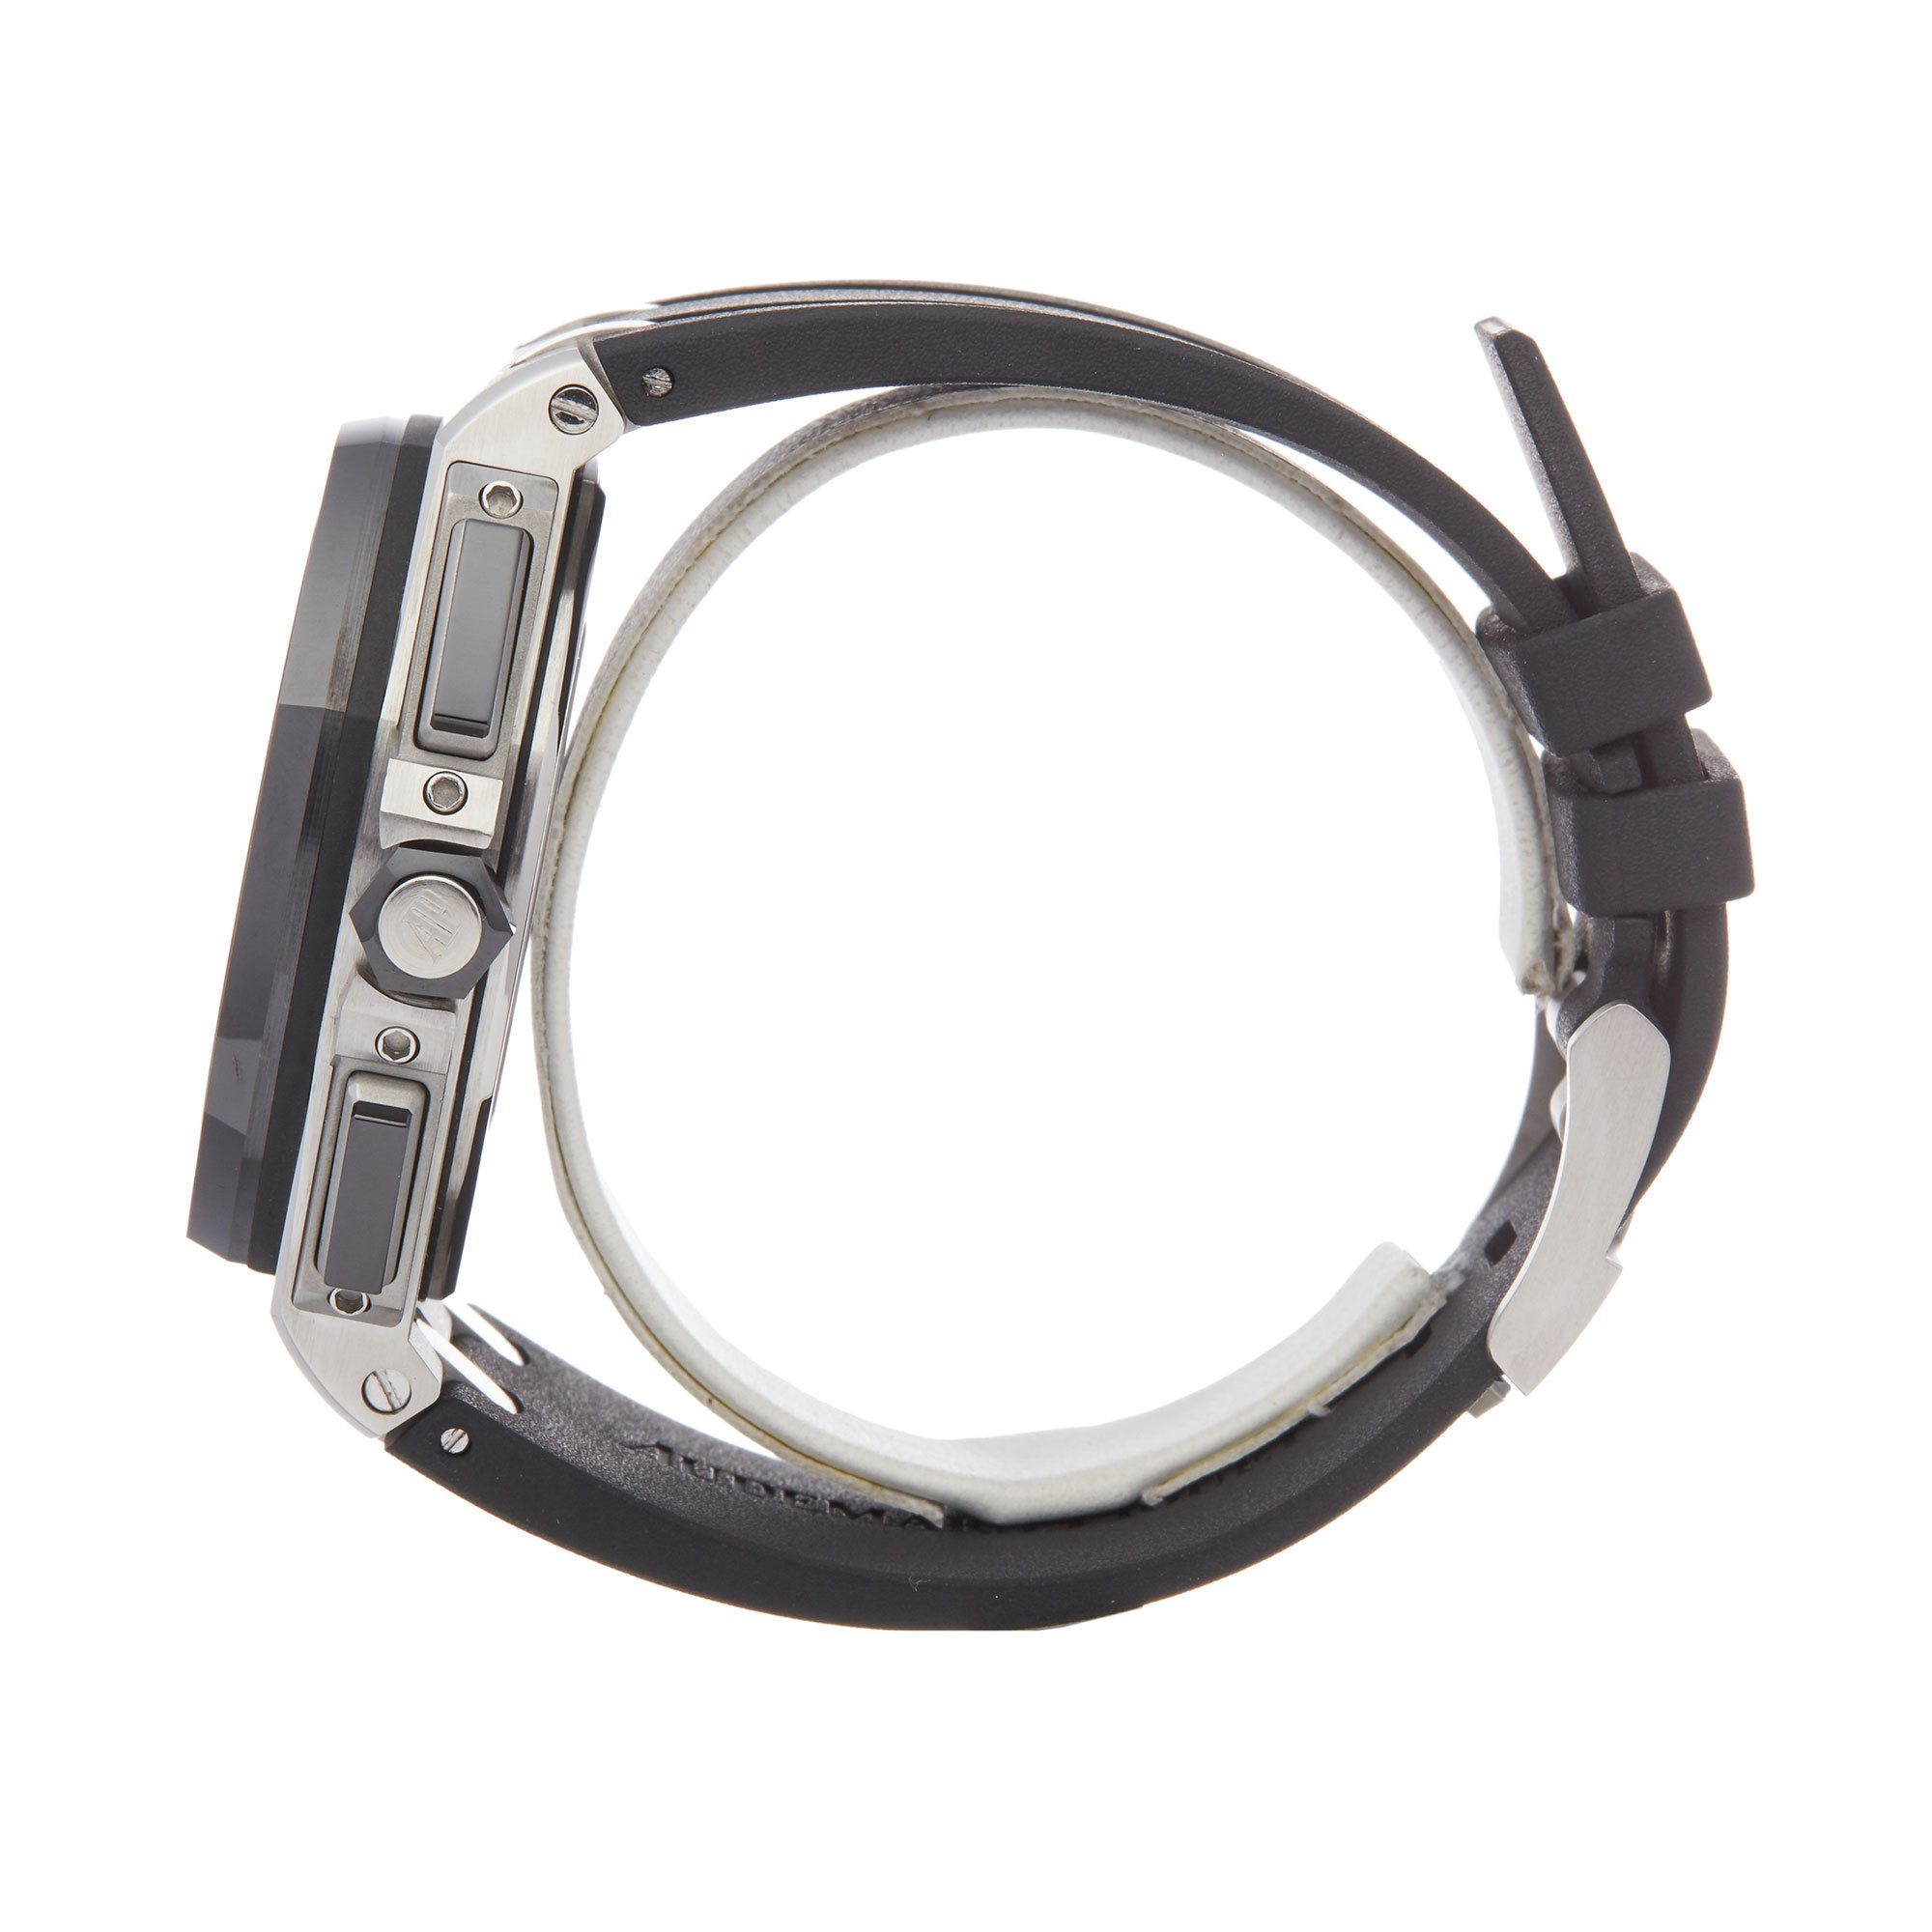 Audemars Piguet Royal Oak Offshore 44mm Chronograph Stainless Steel 26400SO.OO.A002CA.01